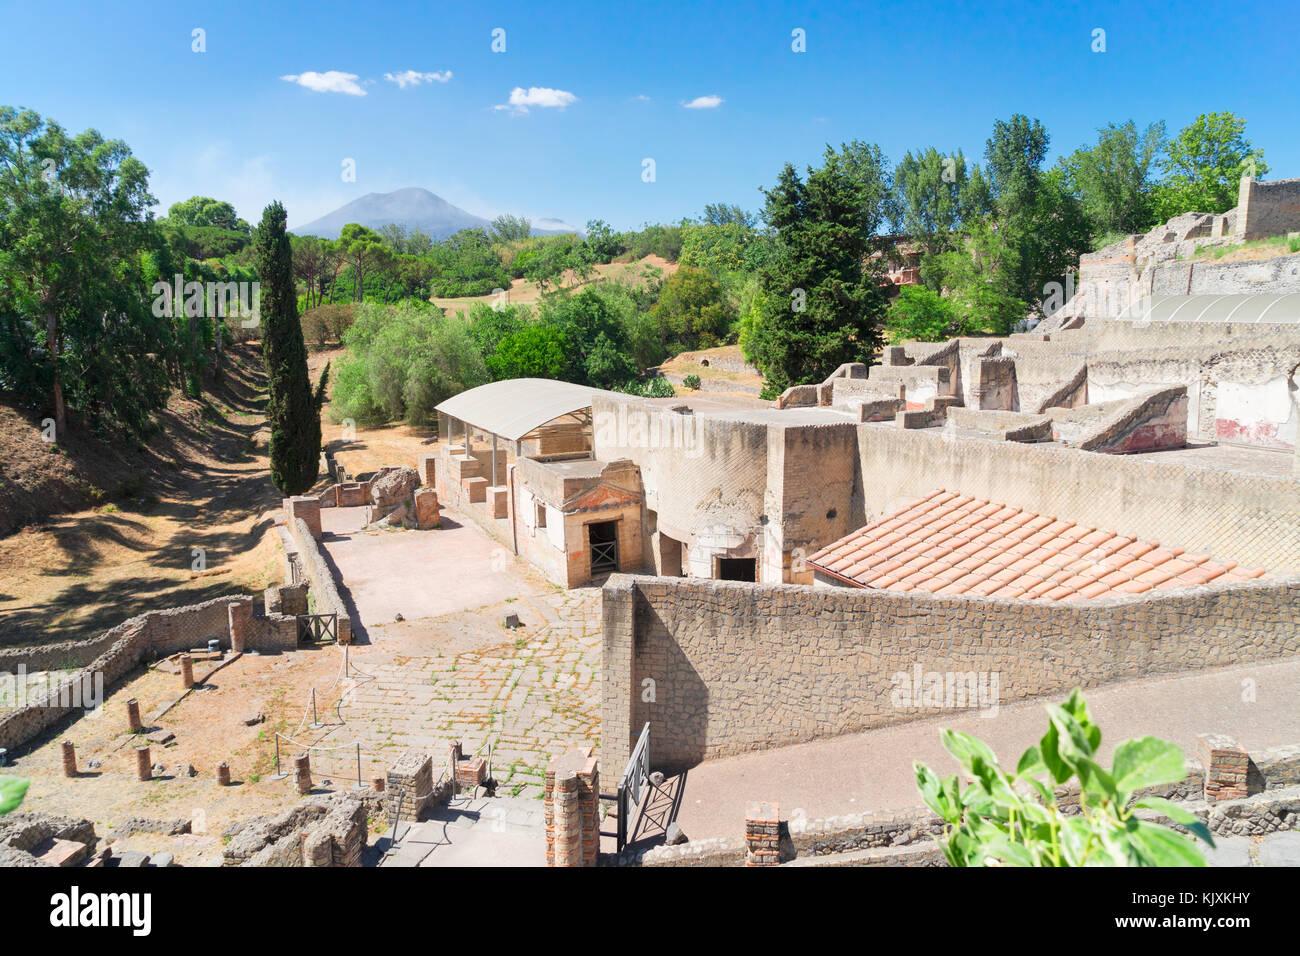 ruins of Pompeii, Italy - Stock Image